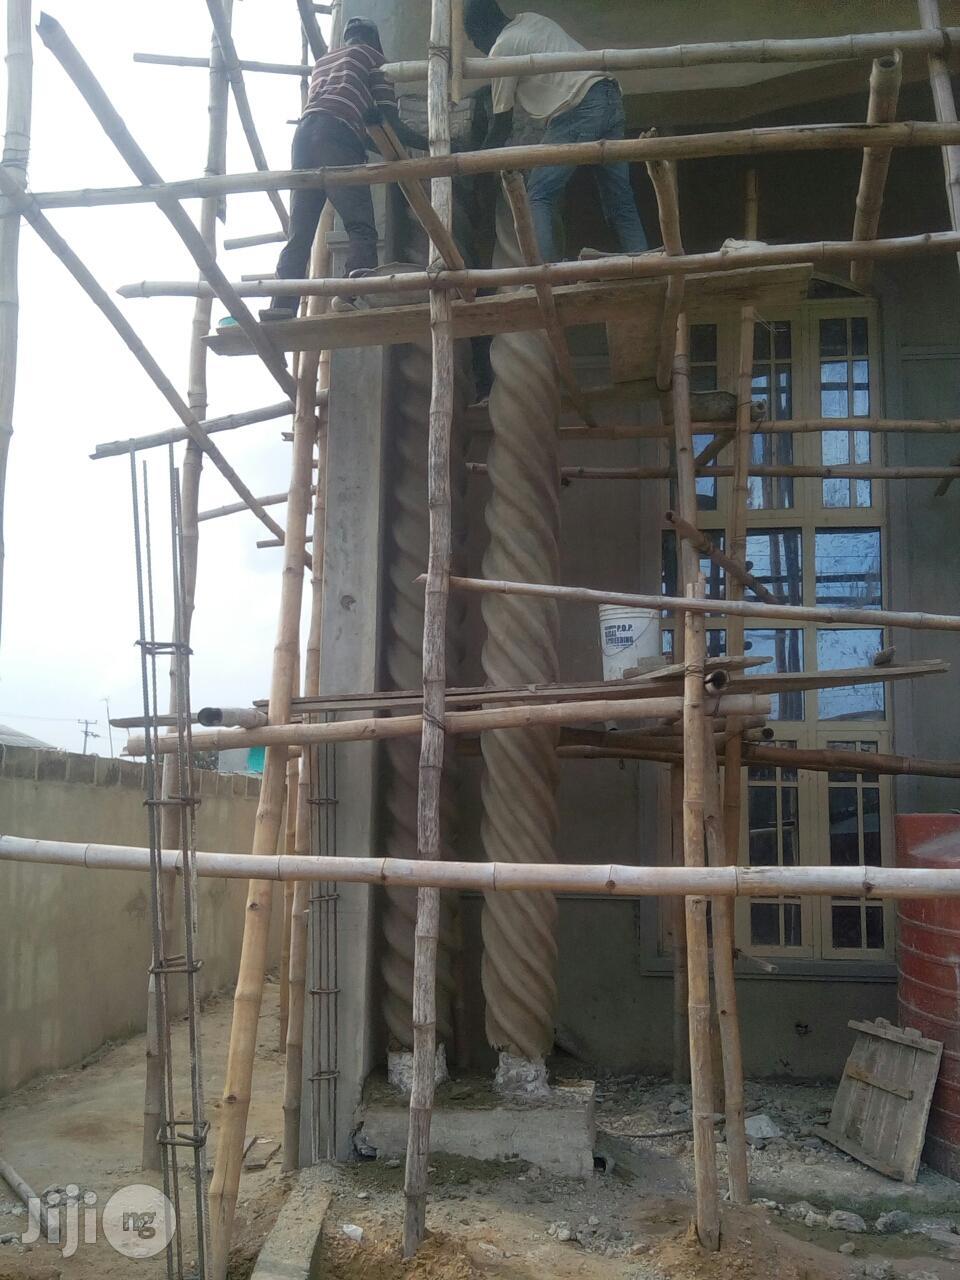 Window, Pillar, Parafet, Fence Cornice And Arc Design Work